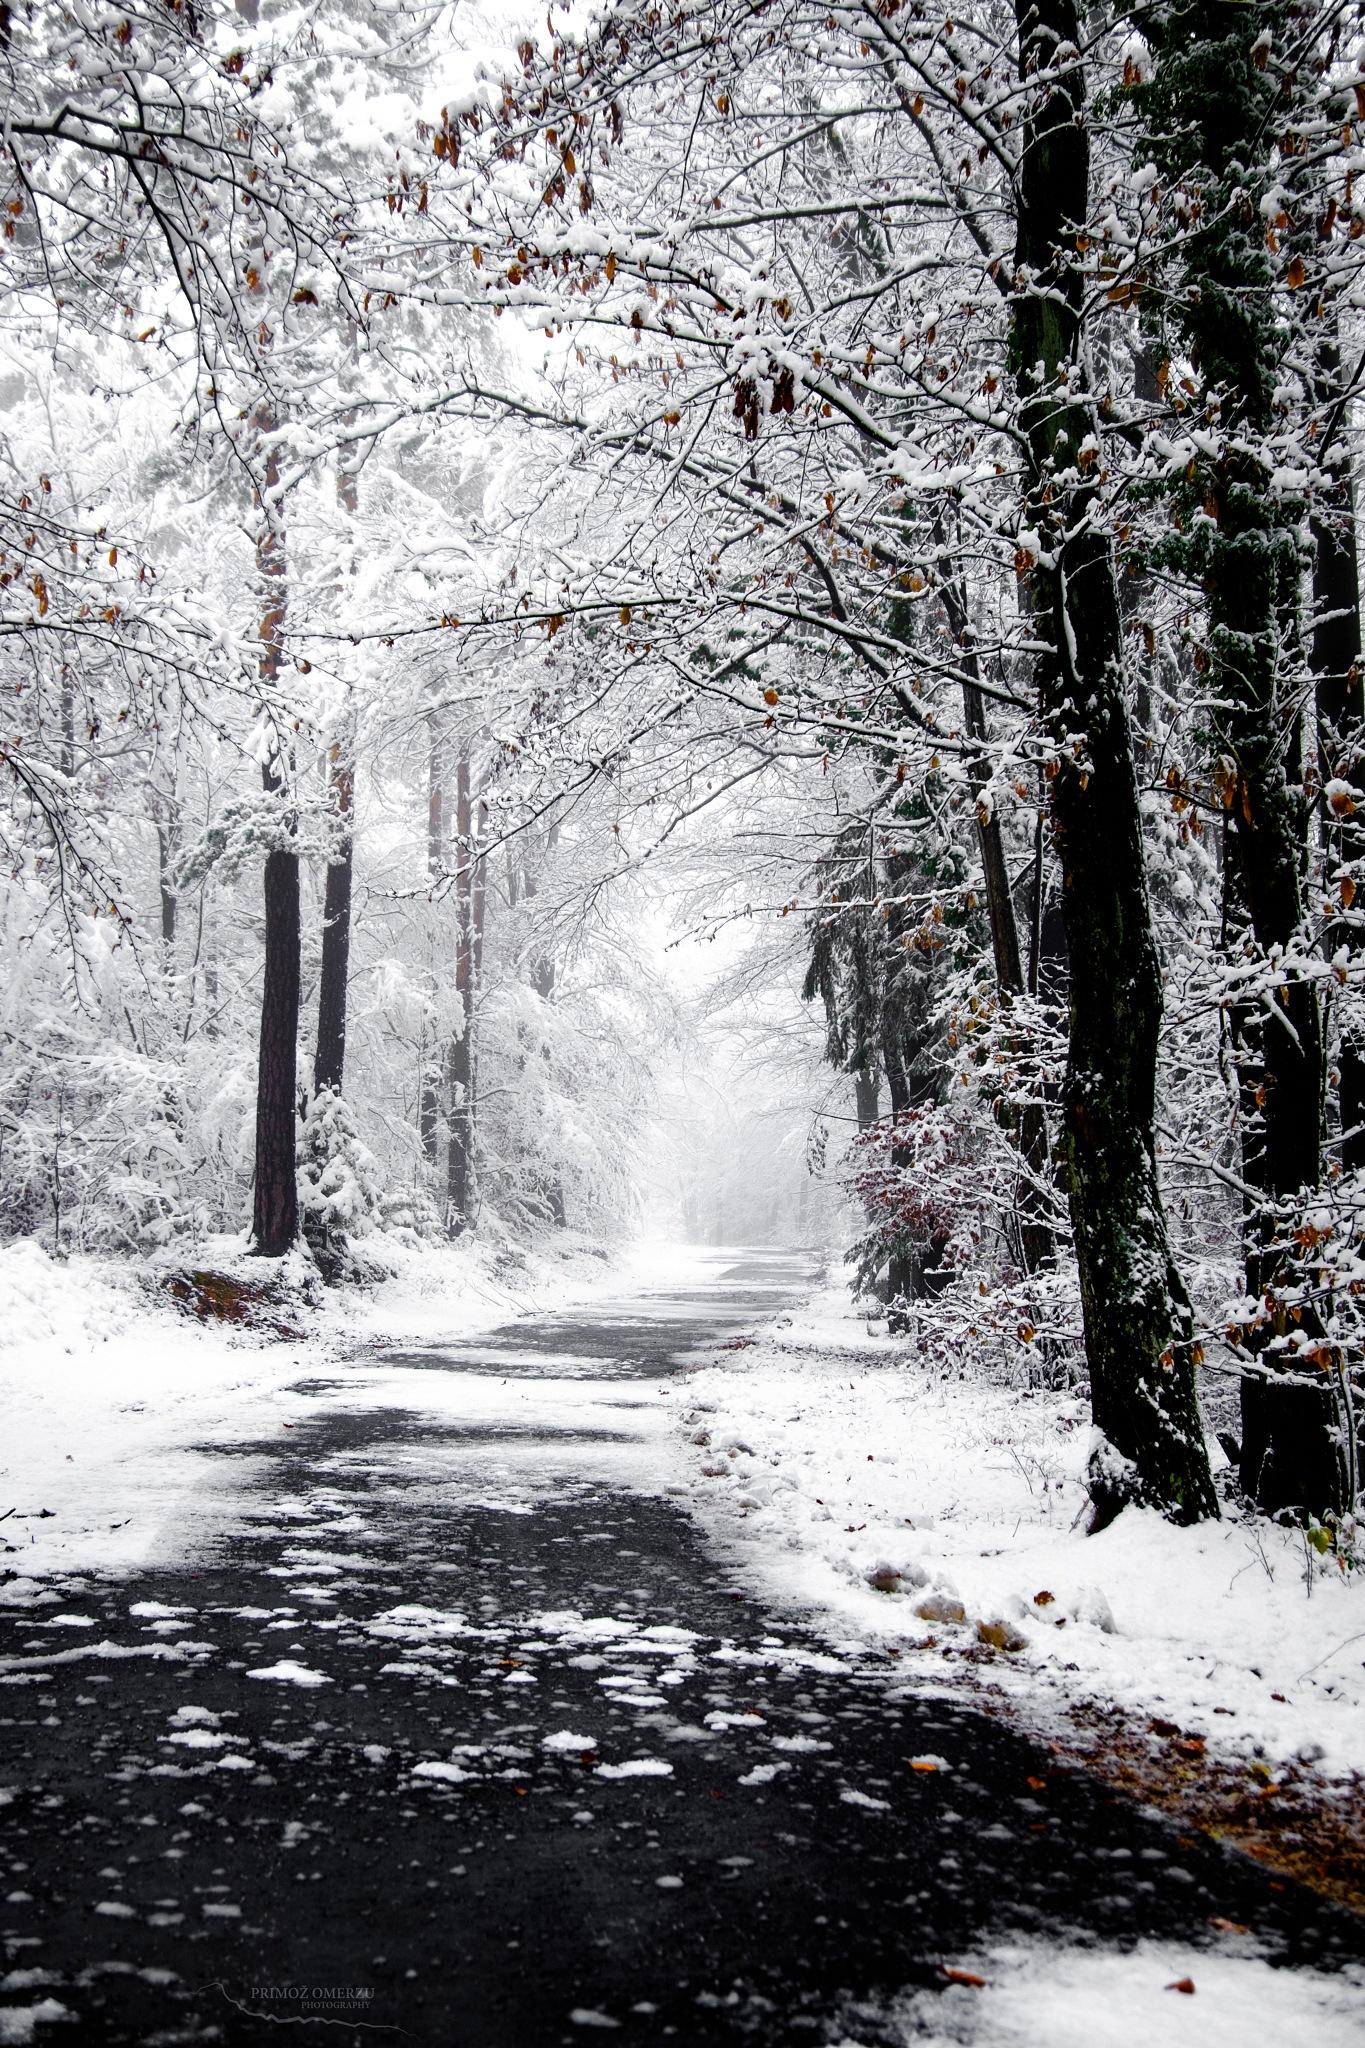 Winter road by Primož Omerzu